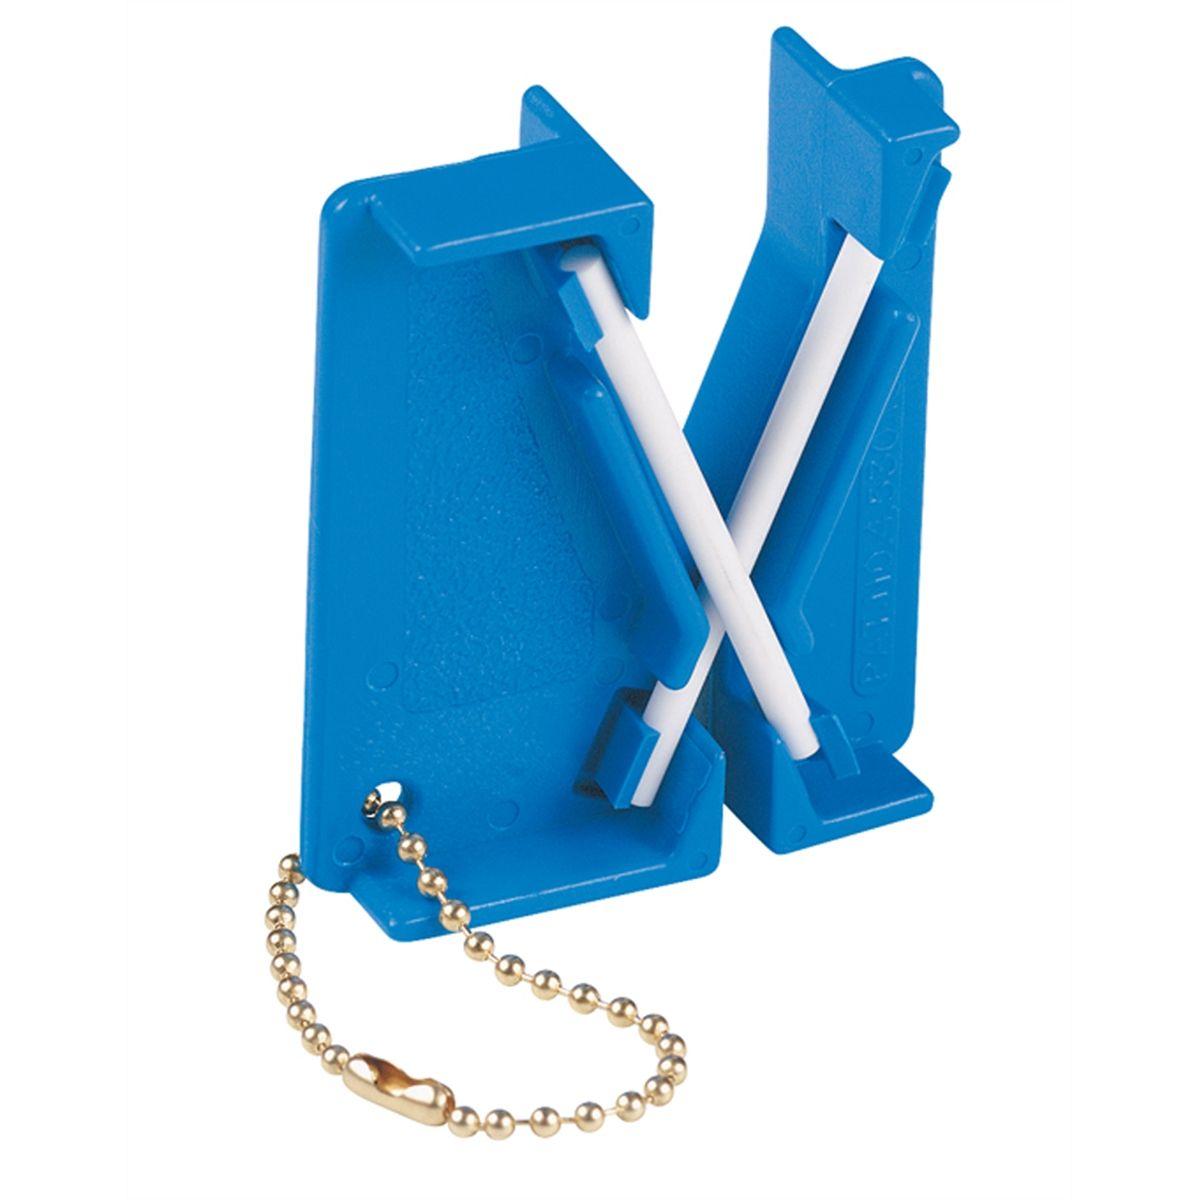 Sharpener Mini Crock Stick For Blades And Fish Hooks